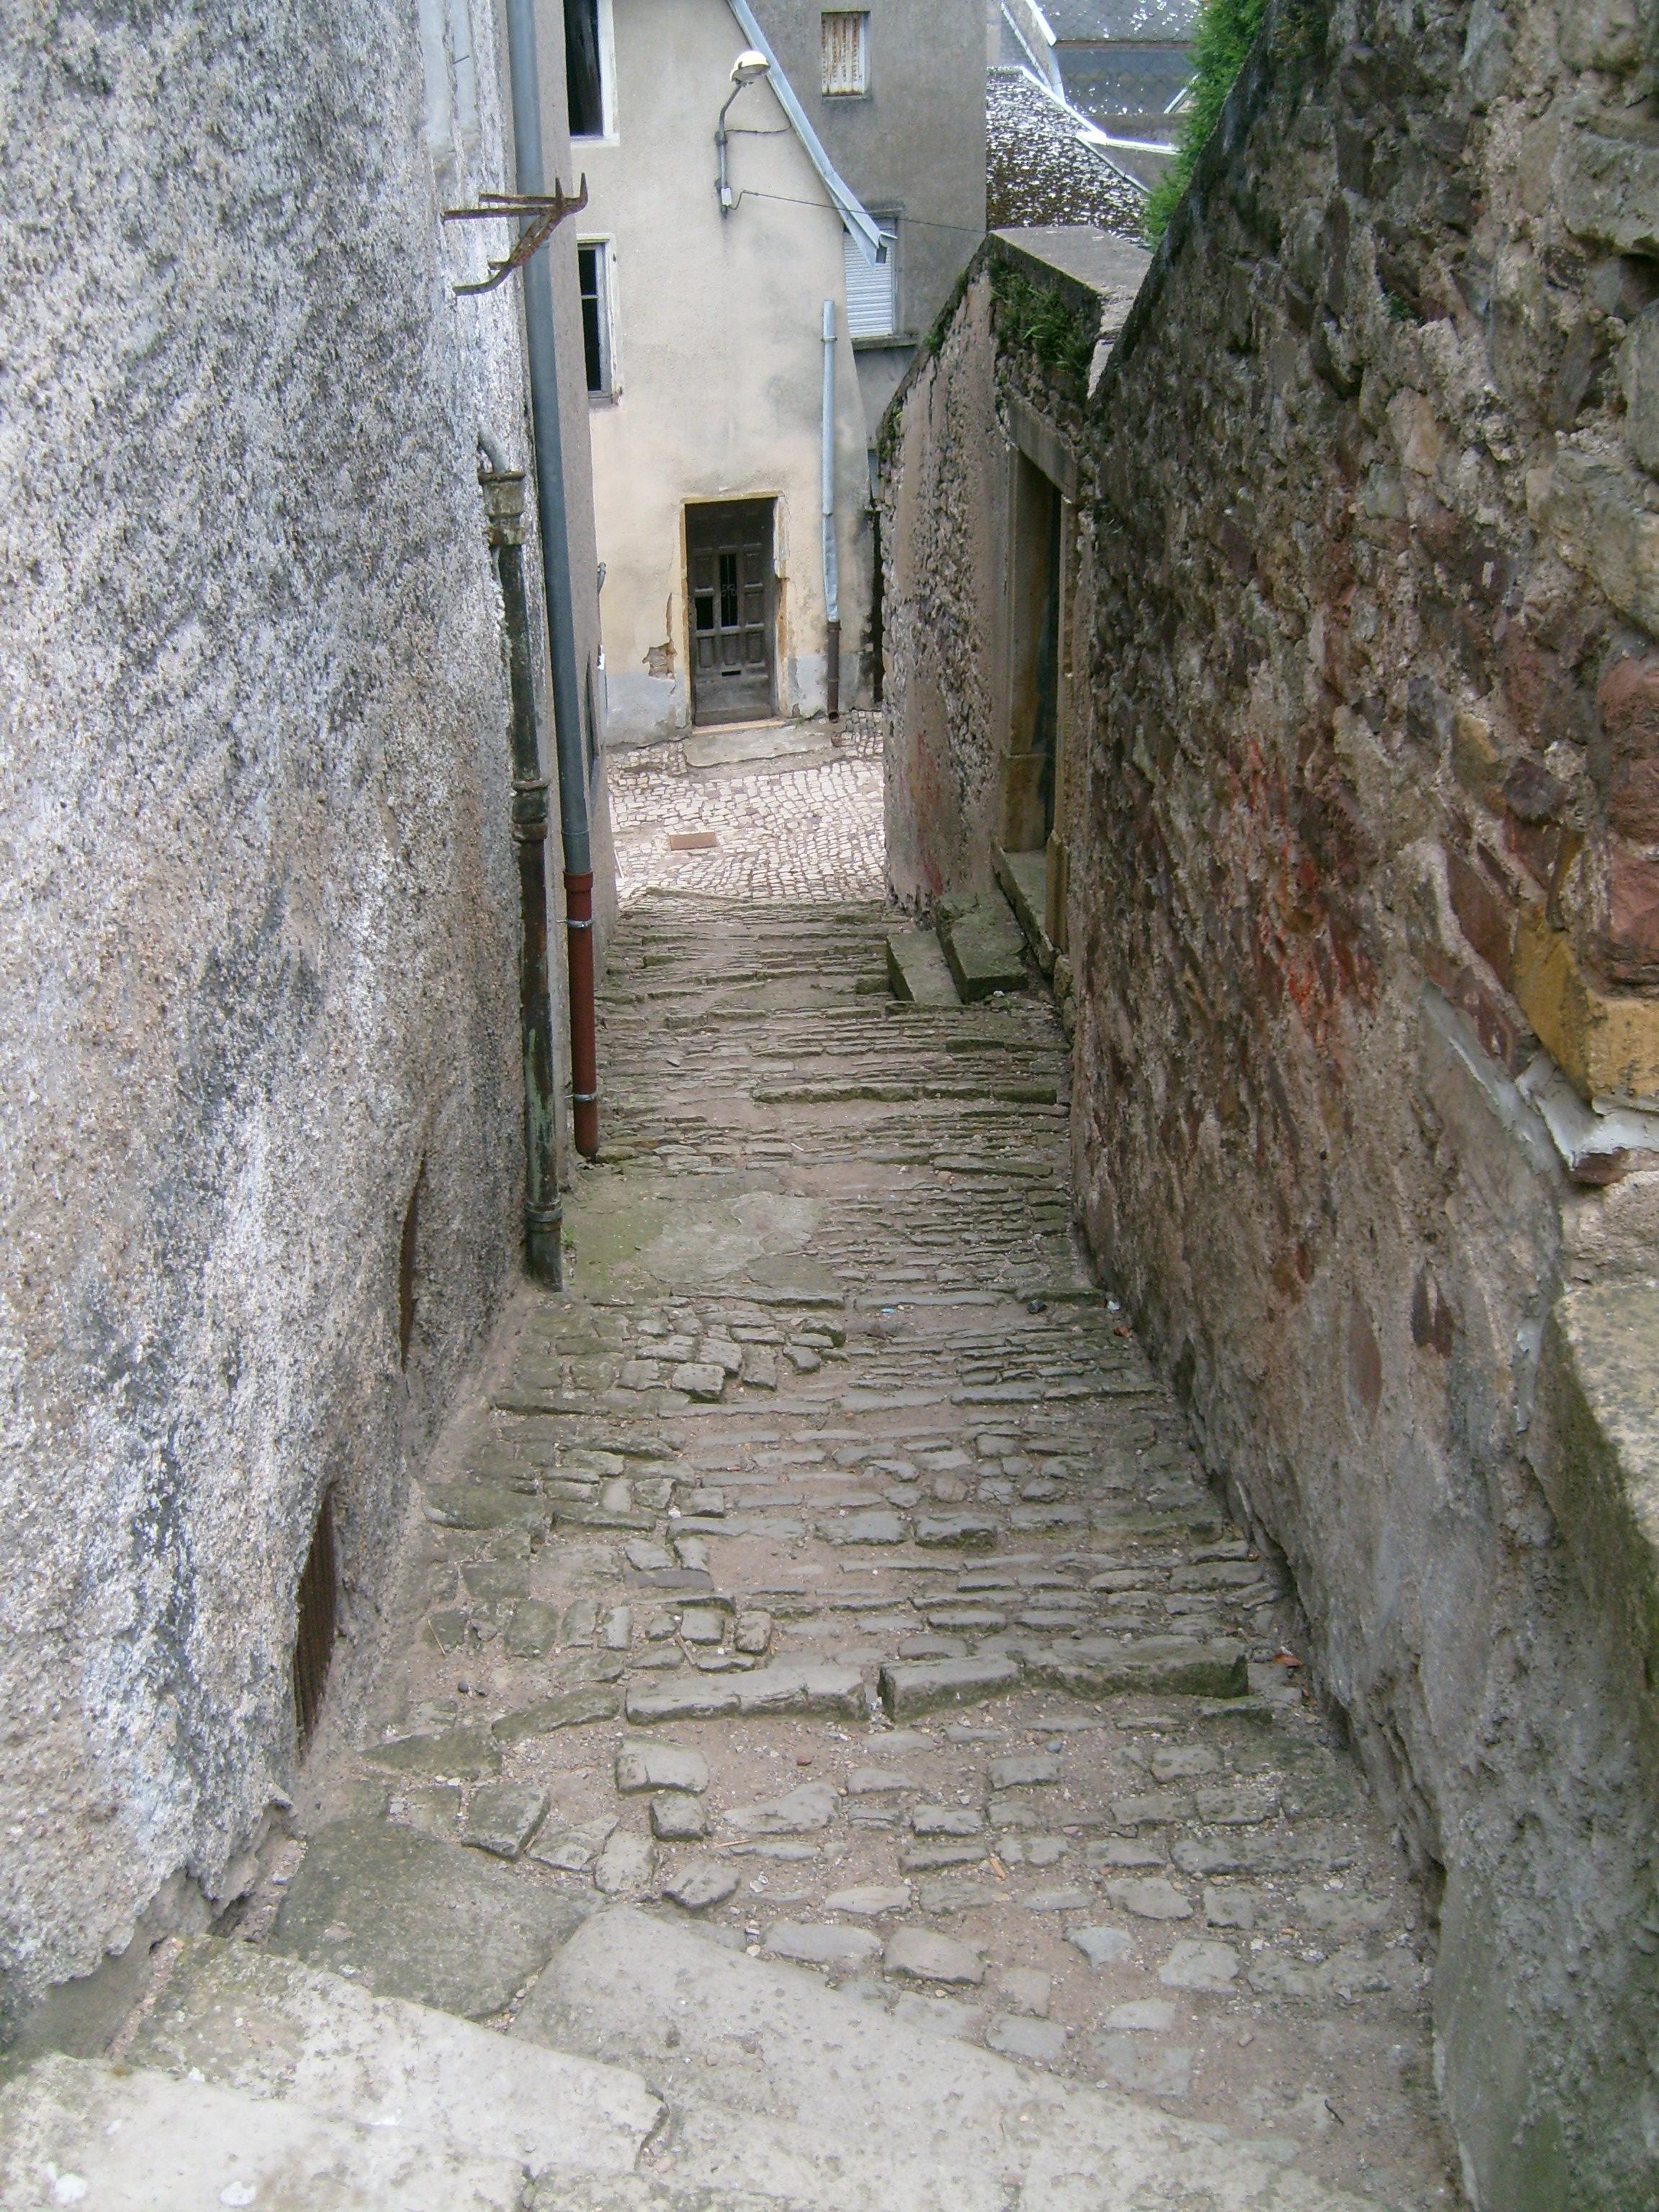 Http Commons Wikimedia Org Wiki File Sierck Les Bains Lorraine France 04 Narrow Street Jpg